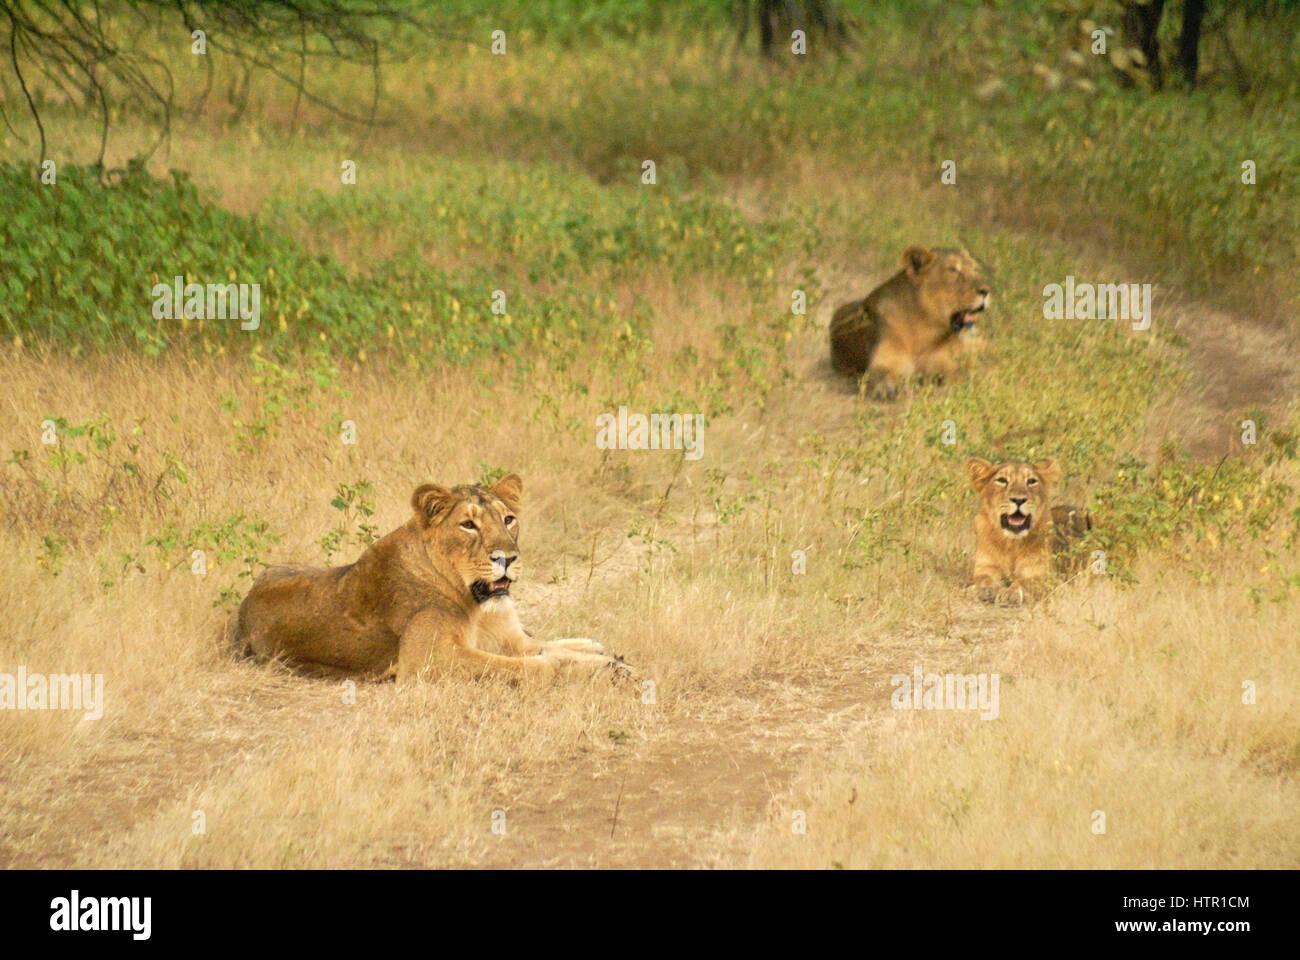 Asiatic (Indian) lions in Sasan Gir (Gir Forest), Gujarat, India - Stock Image